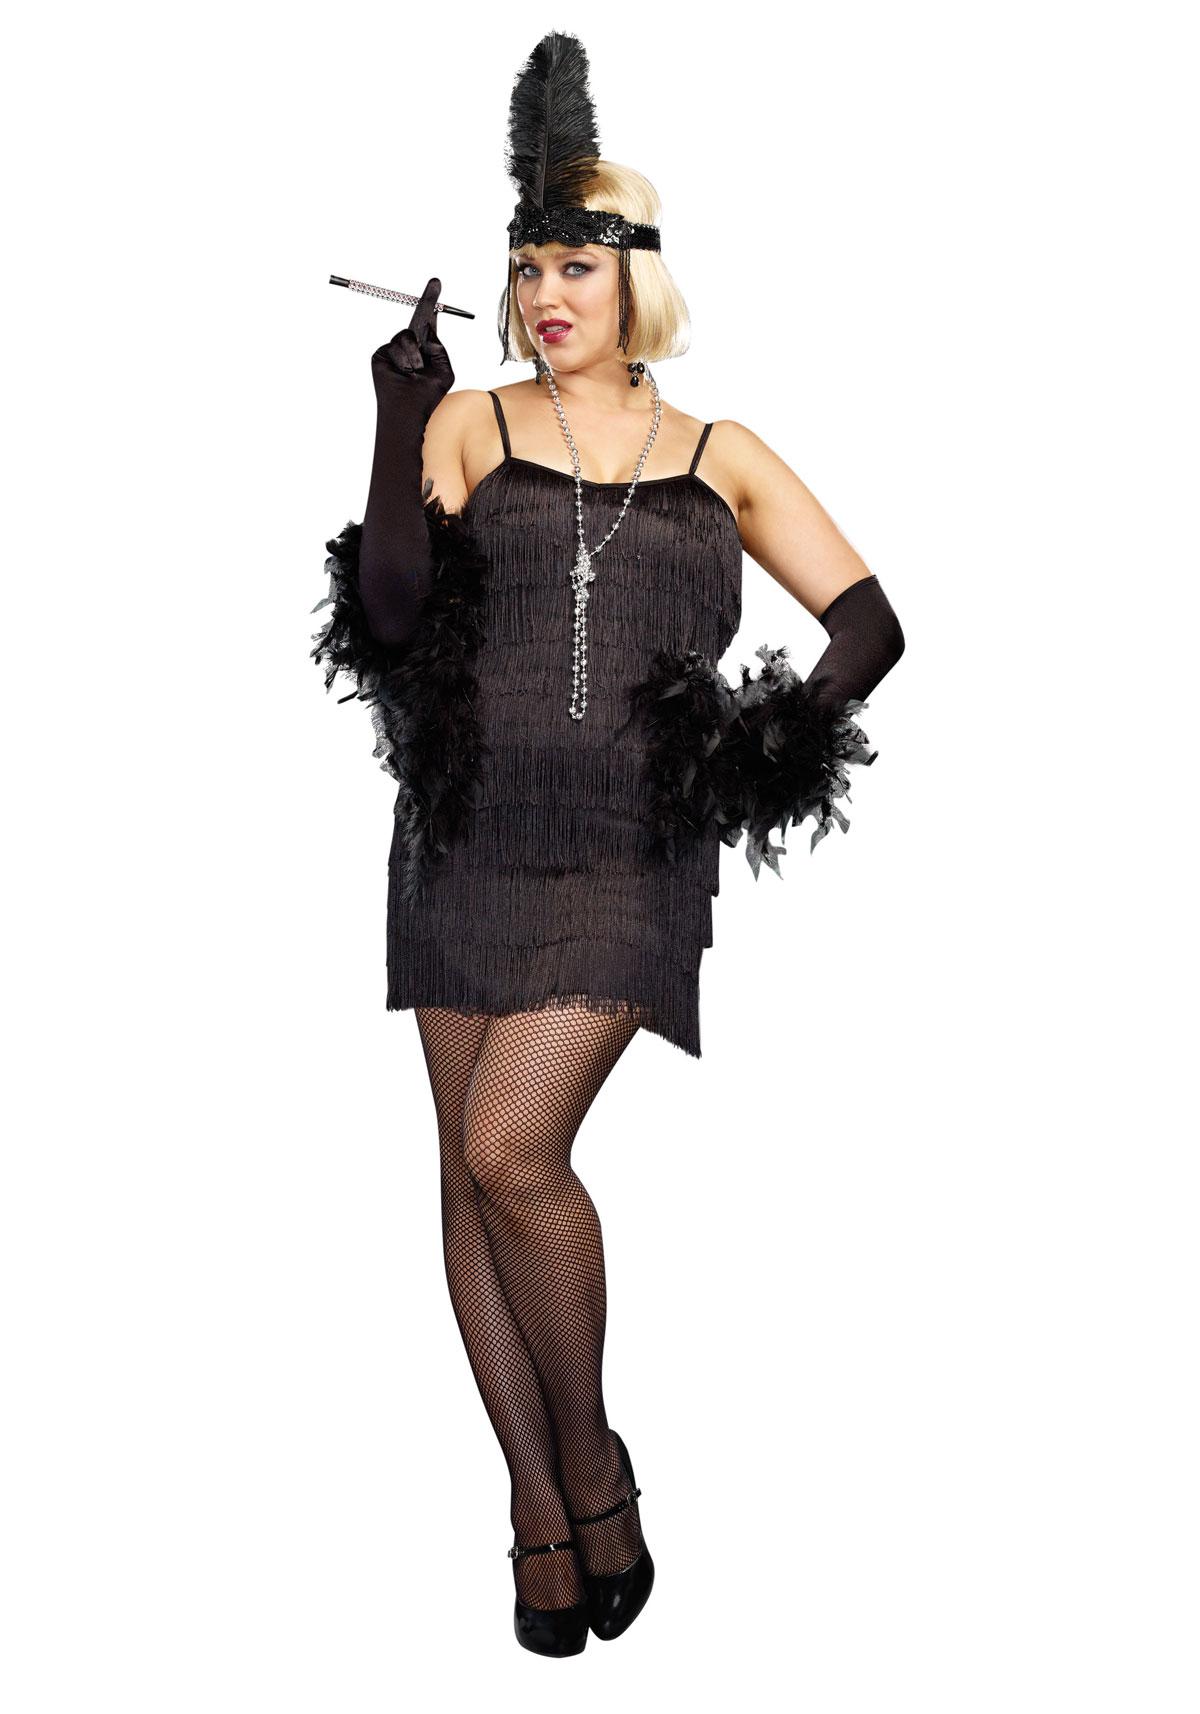 Dreamgirl 8912x Plus Size Basic Flapper Dress Costume Ebay  sc 1 st  Meningrey & Dreamgirl Plus Size Costumes - Meningrey